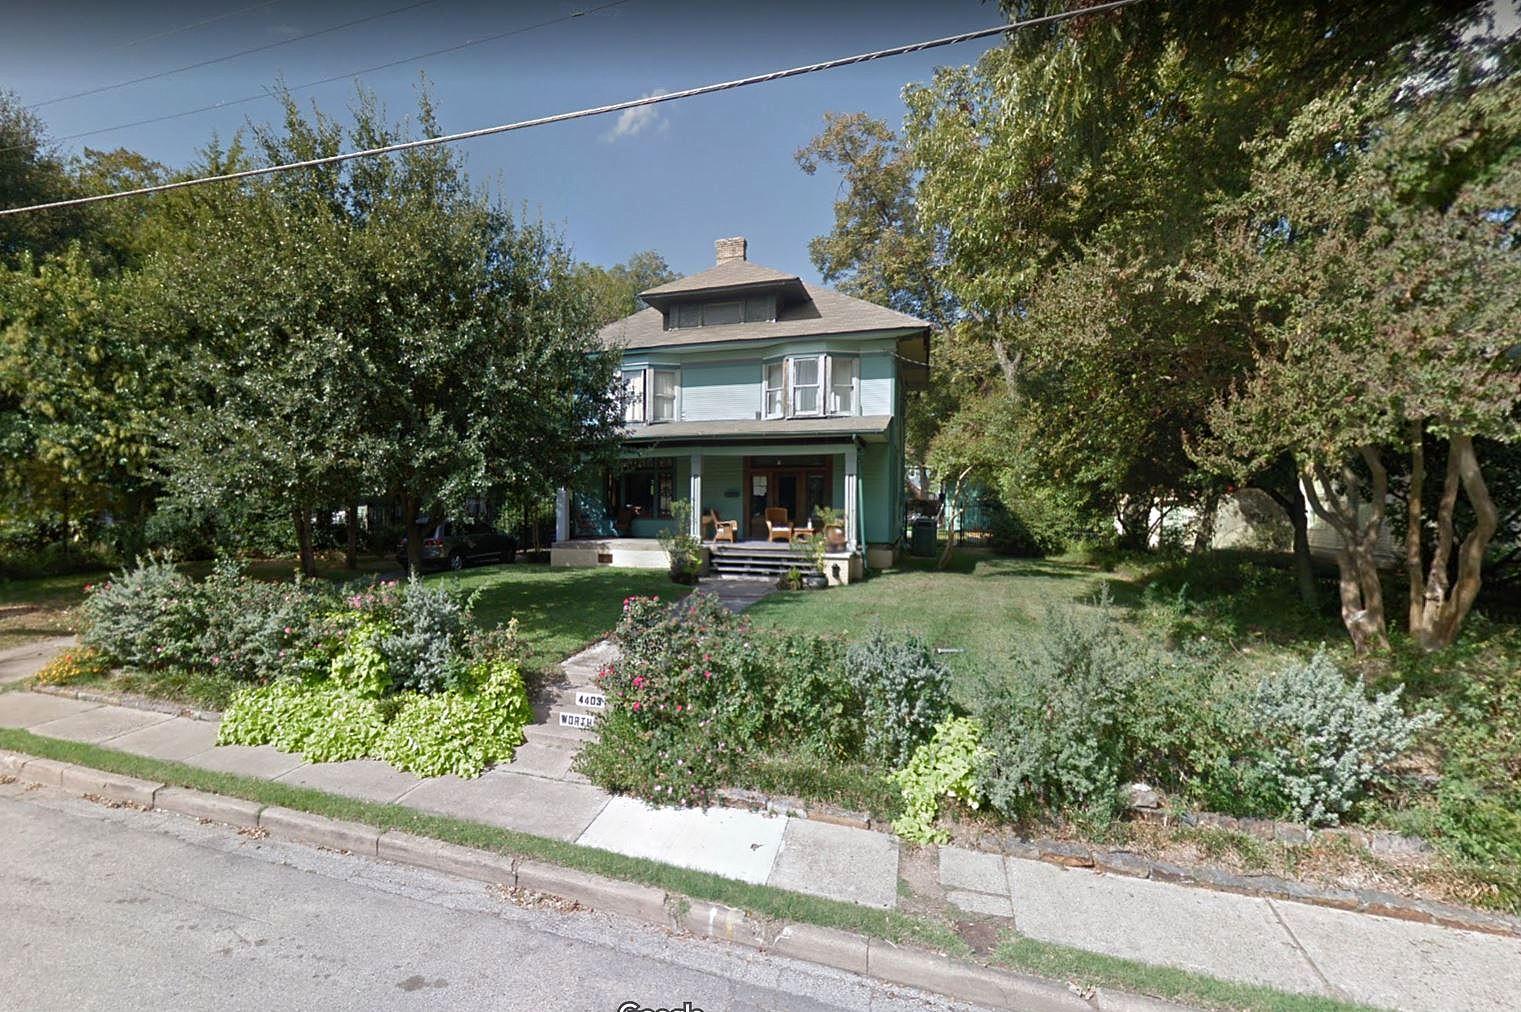 worth-street_google-street-view_2016